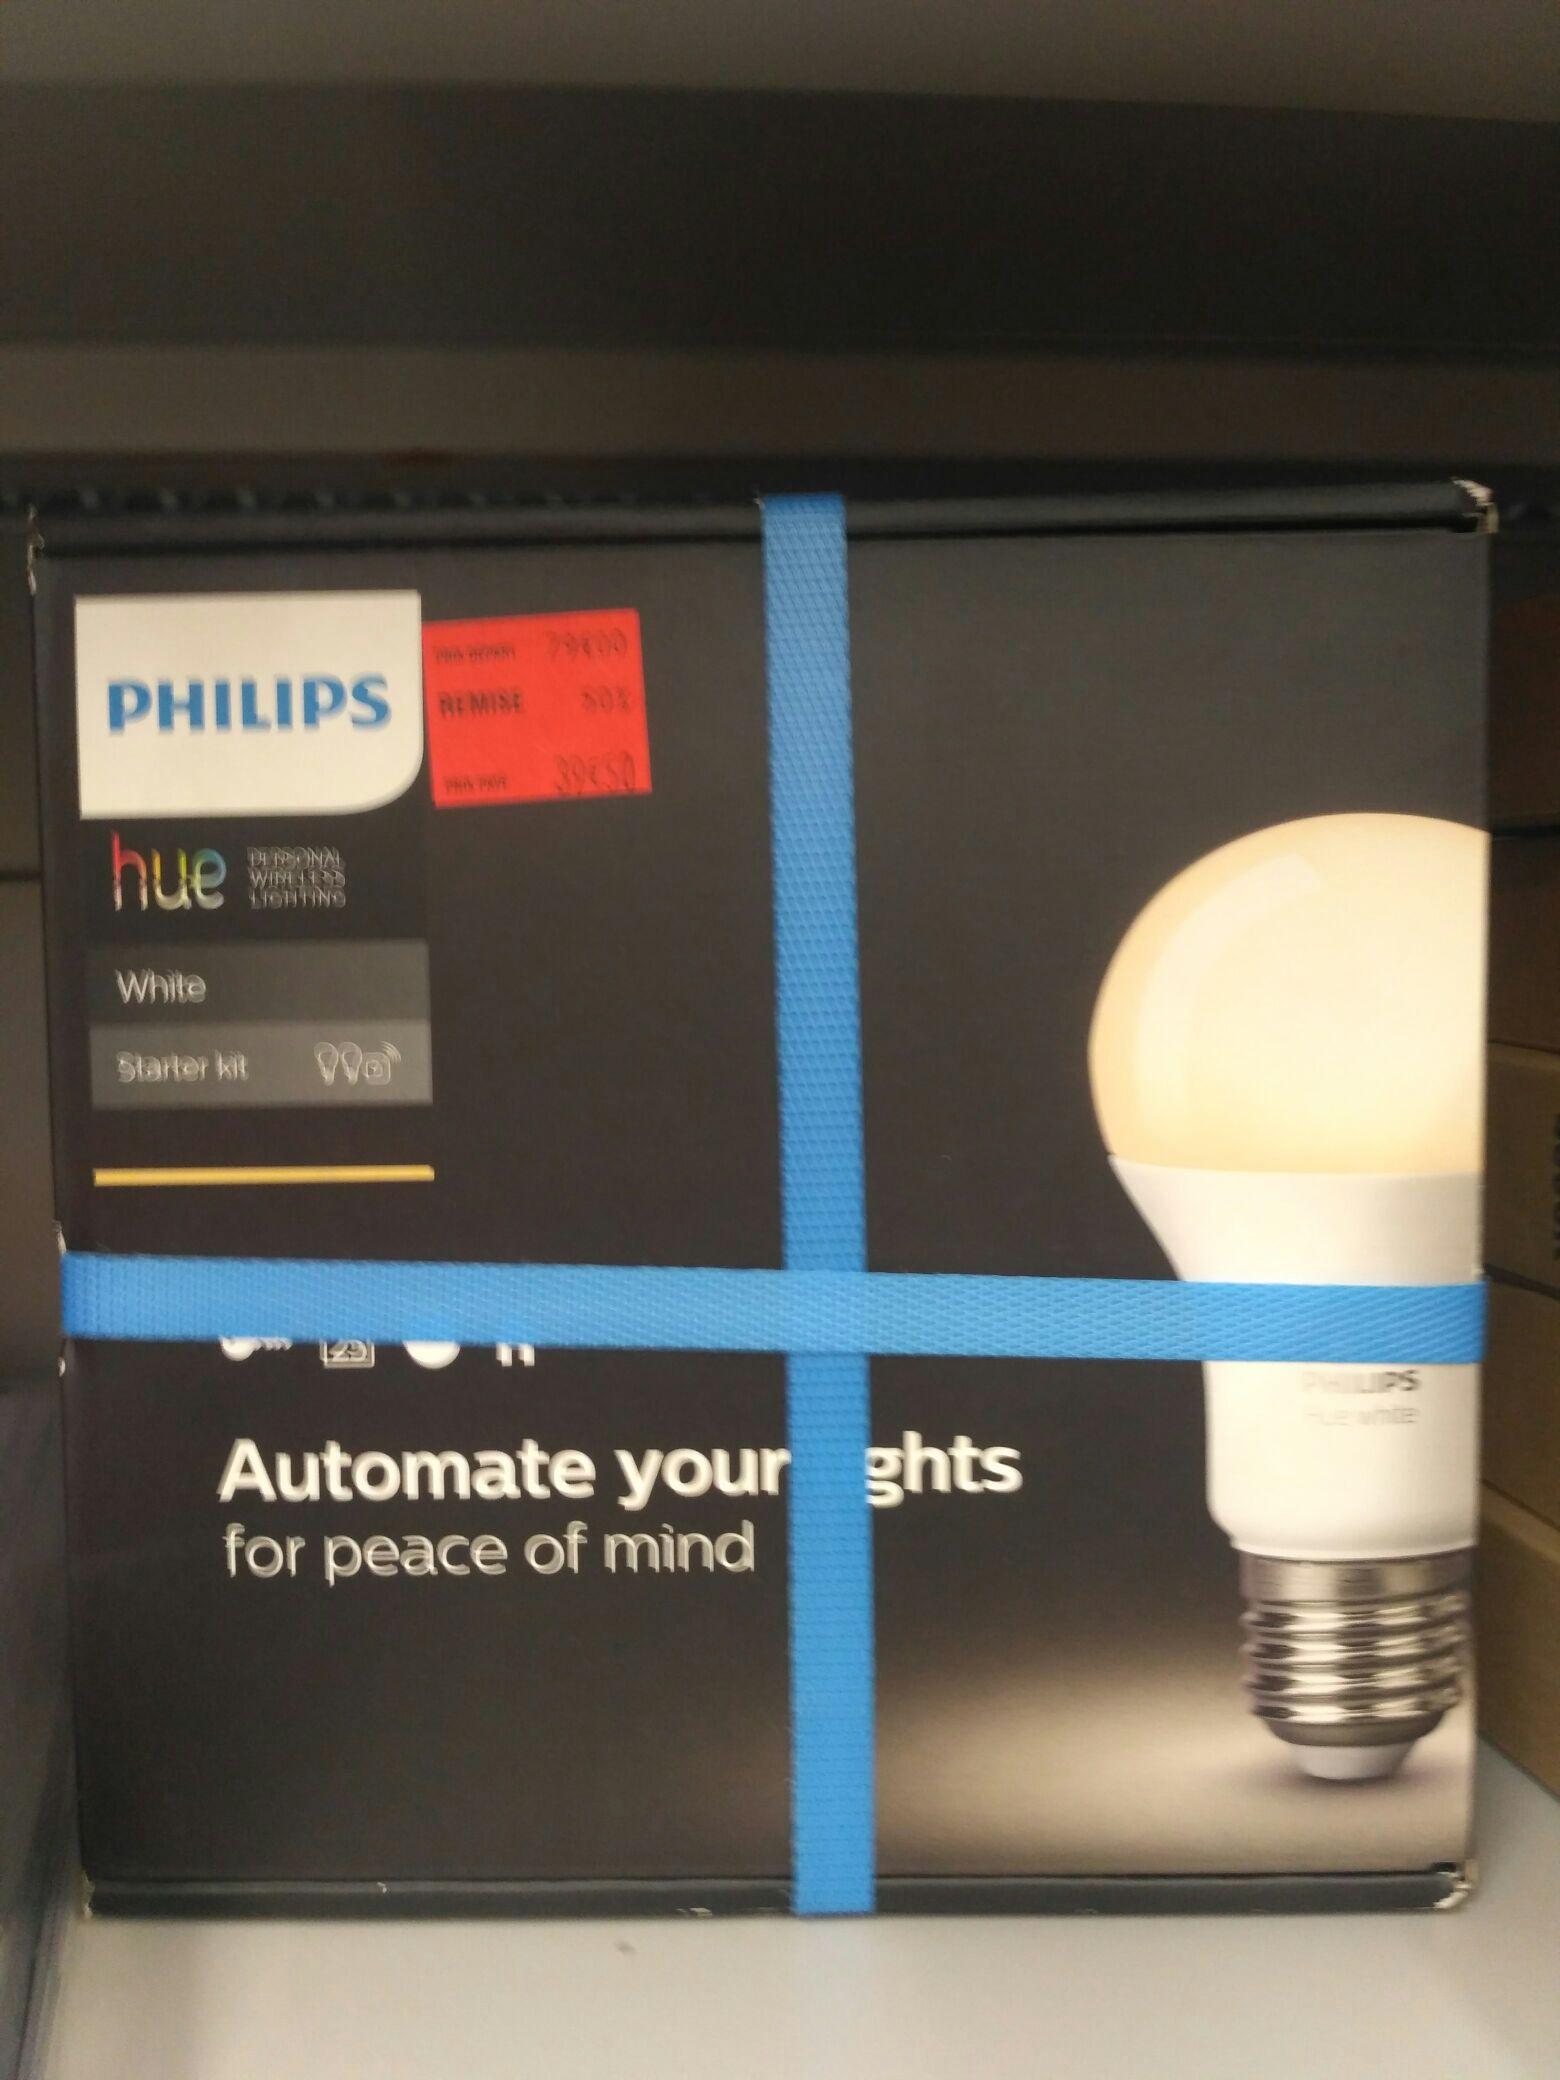 Kit de démarrage Philips hue - Vaulx-en-Velin (69)